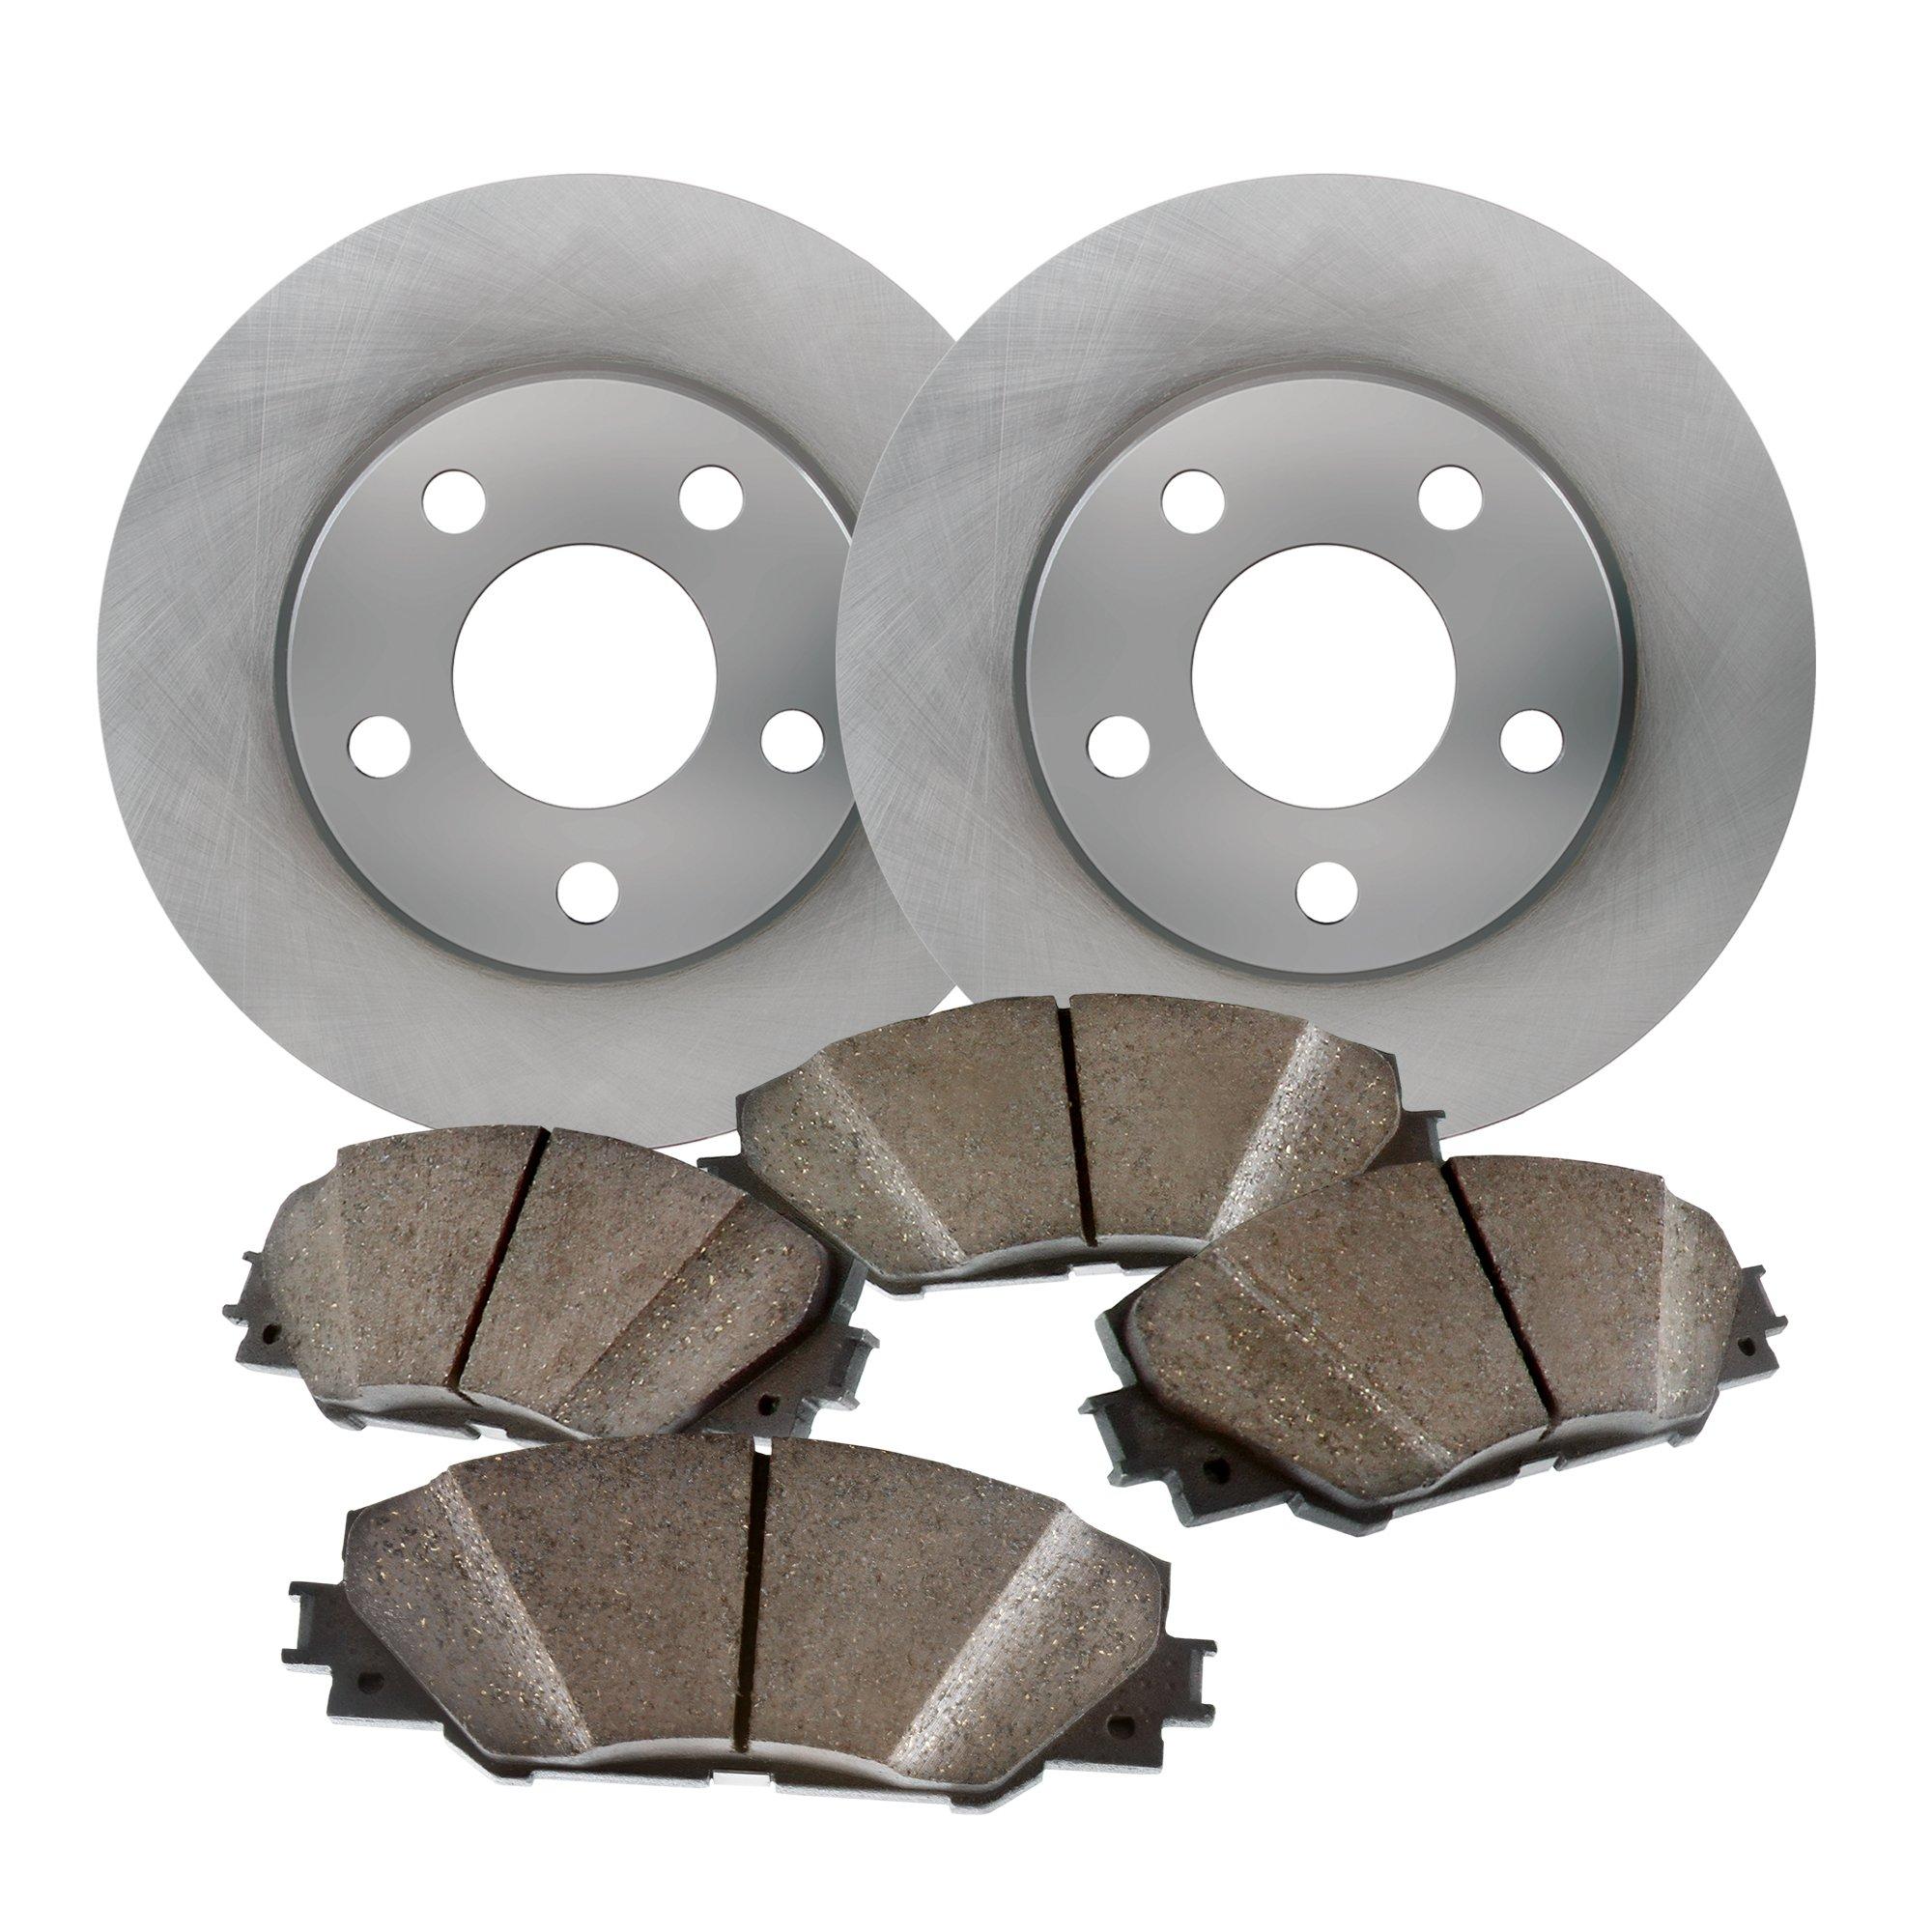 Front Premium Quiet technology Brake Rotors and severe Duty Metallic Pads MAXE4062M   Fits: Q7 Cayenne Touareg